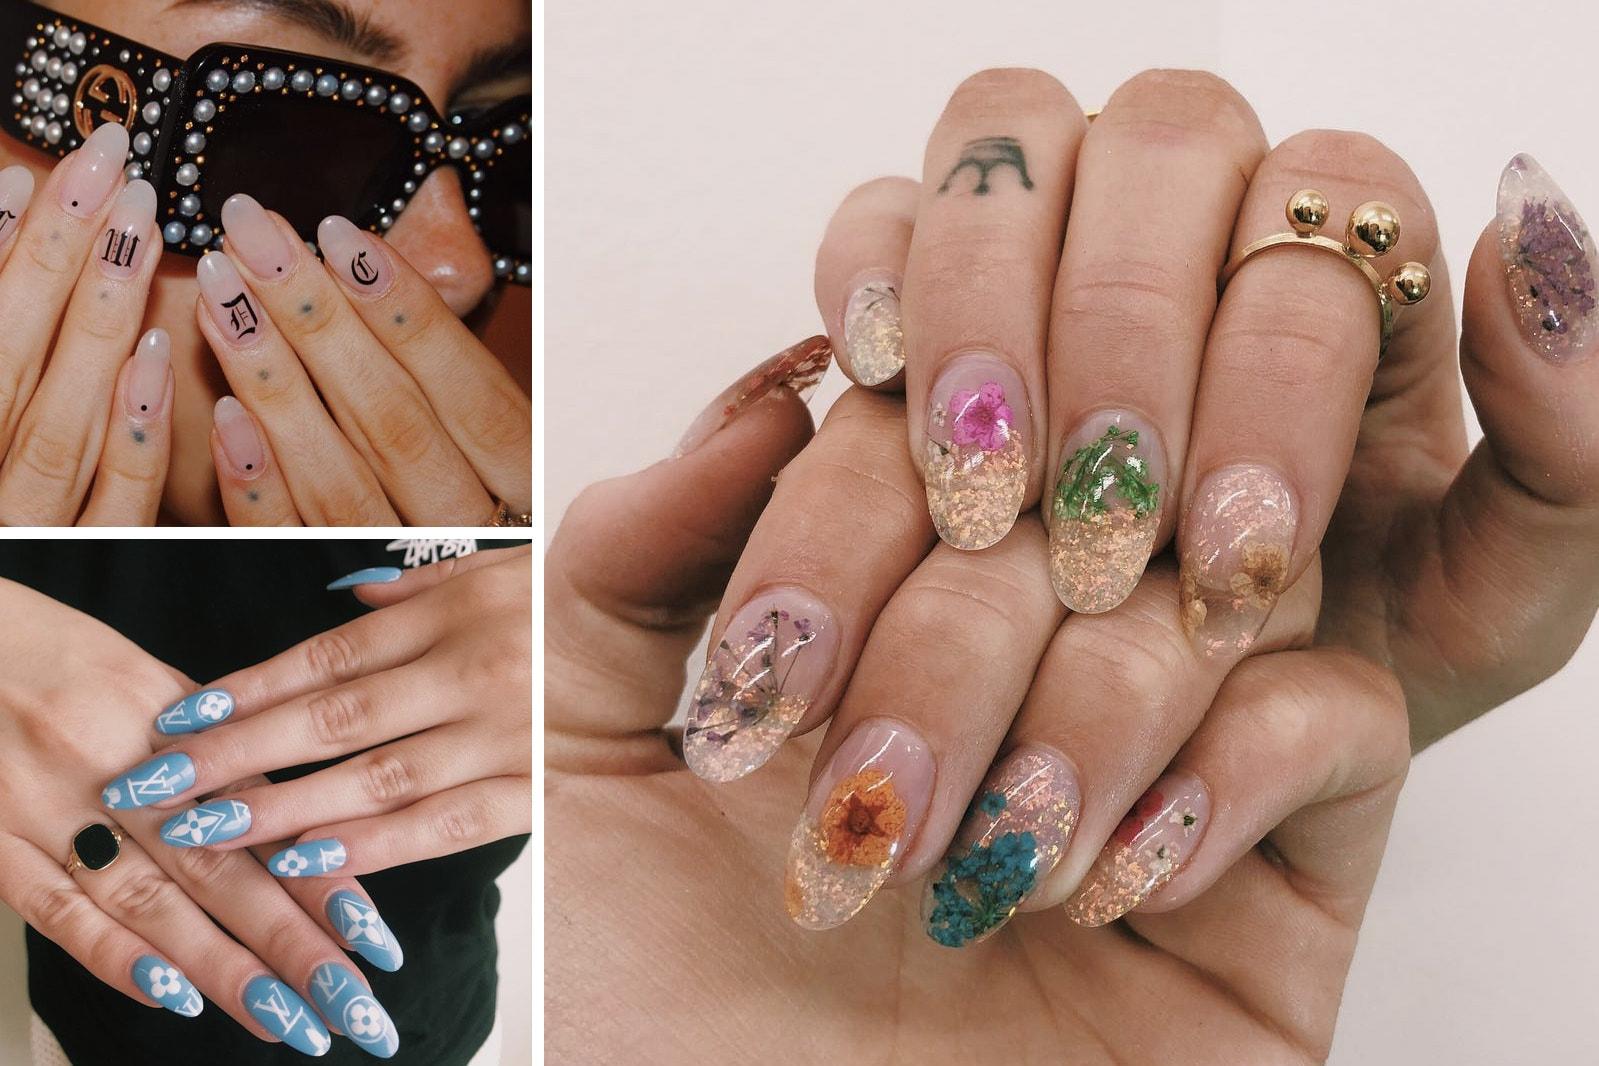 Best Top Central East South London Nail Art Salons WAH Nails Imarni Skinnydip Nail Club Nail'd It Reecey Roos